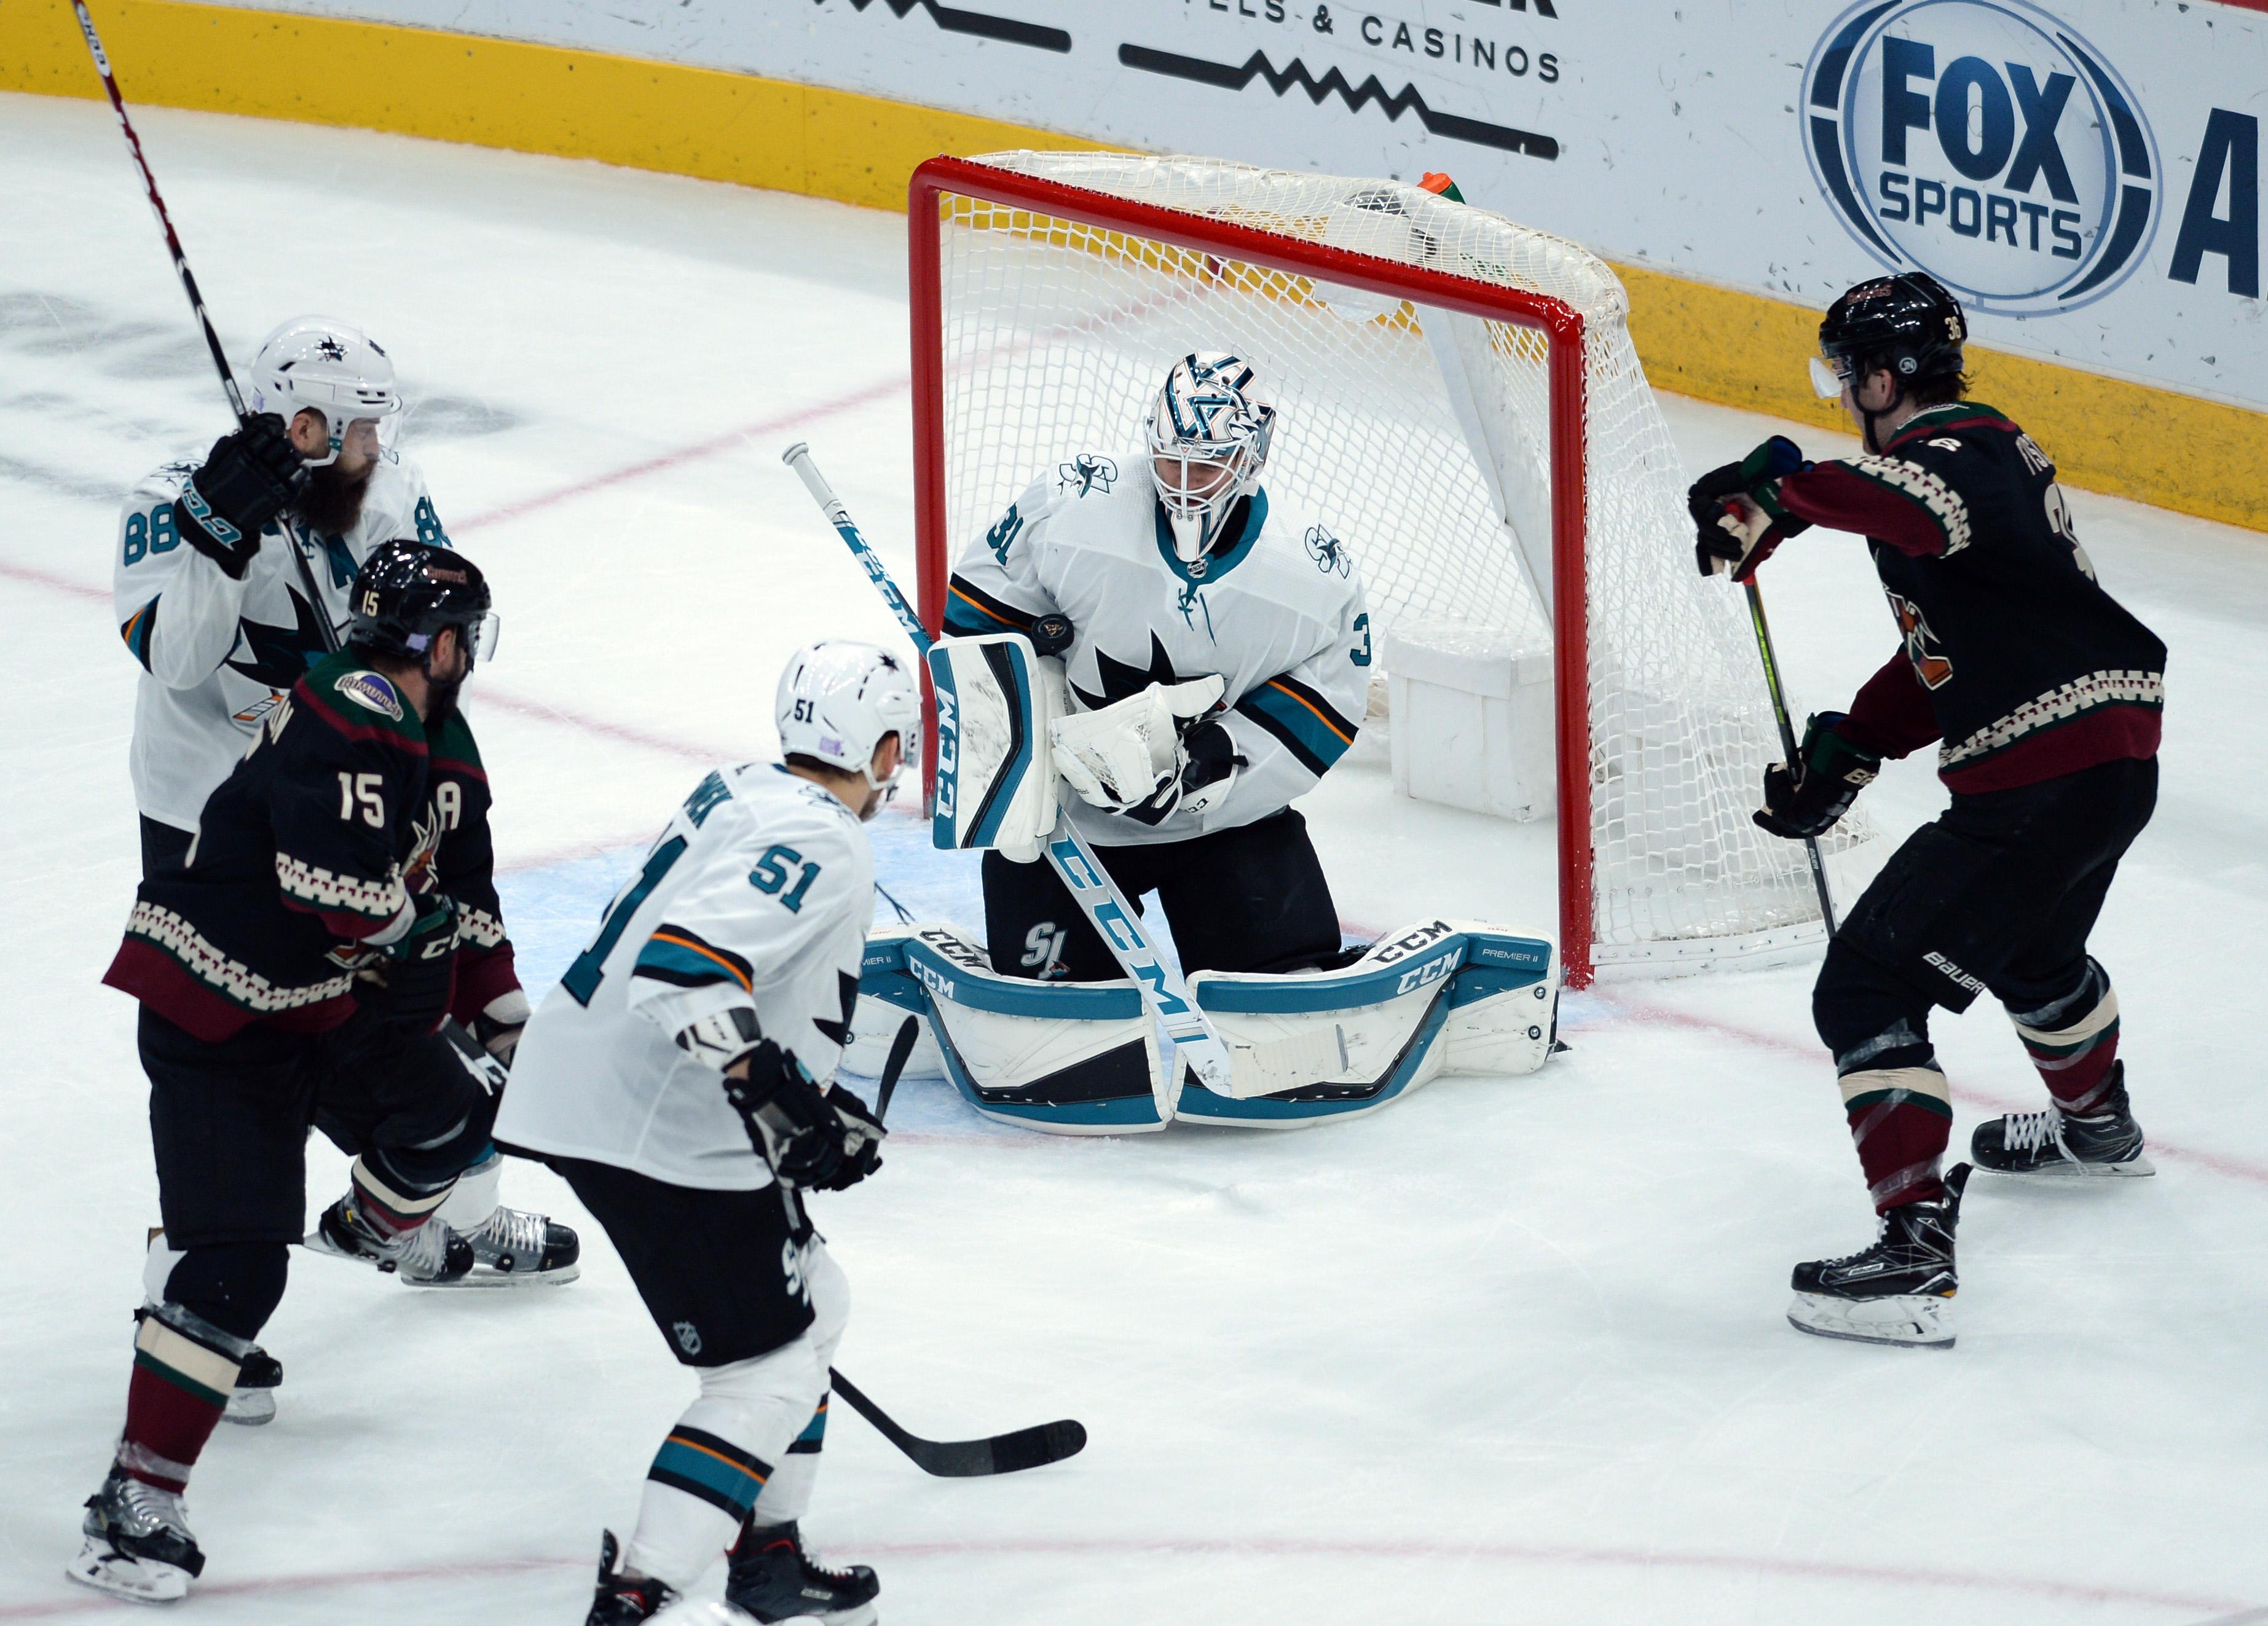 Nov 30, 2019; Glendale, AZ, USA; San Jose Sharks goaltender Martin Jones (31) makes a save against the Arizona Coyotes during the second period at Gila River Arena.